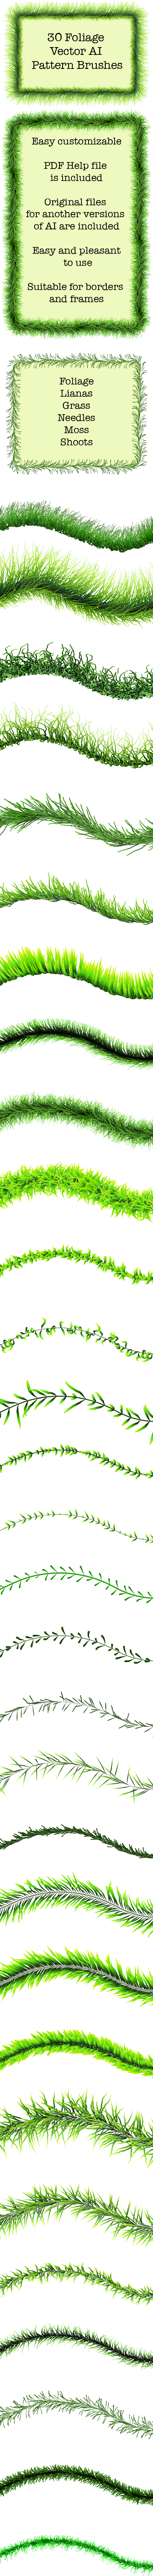 30 Green Foliage Brushes - Vector Adobe Illustrator Pattern Plant Brushes - Miscellaneous Brushes